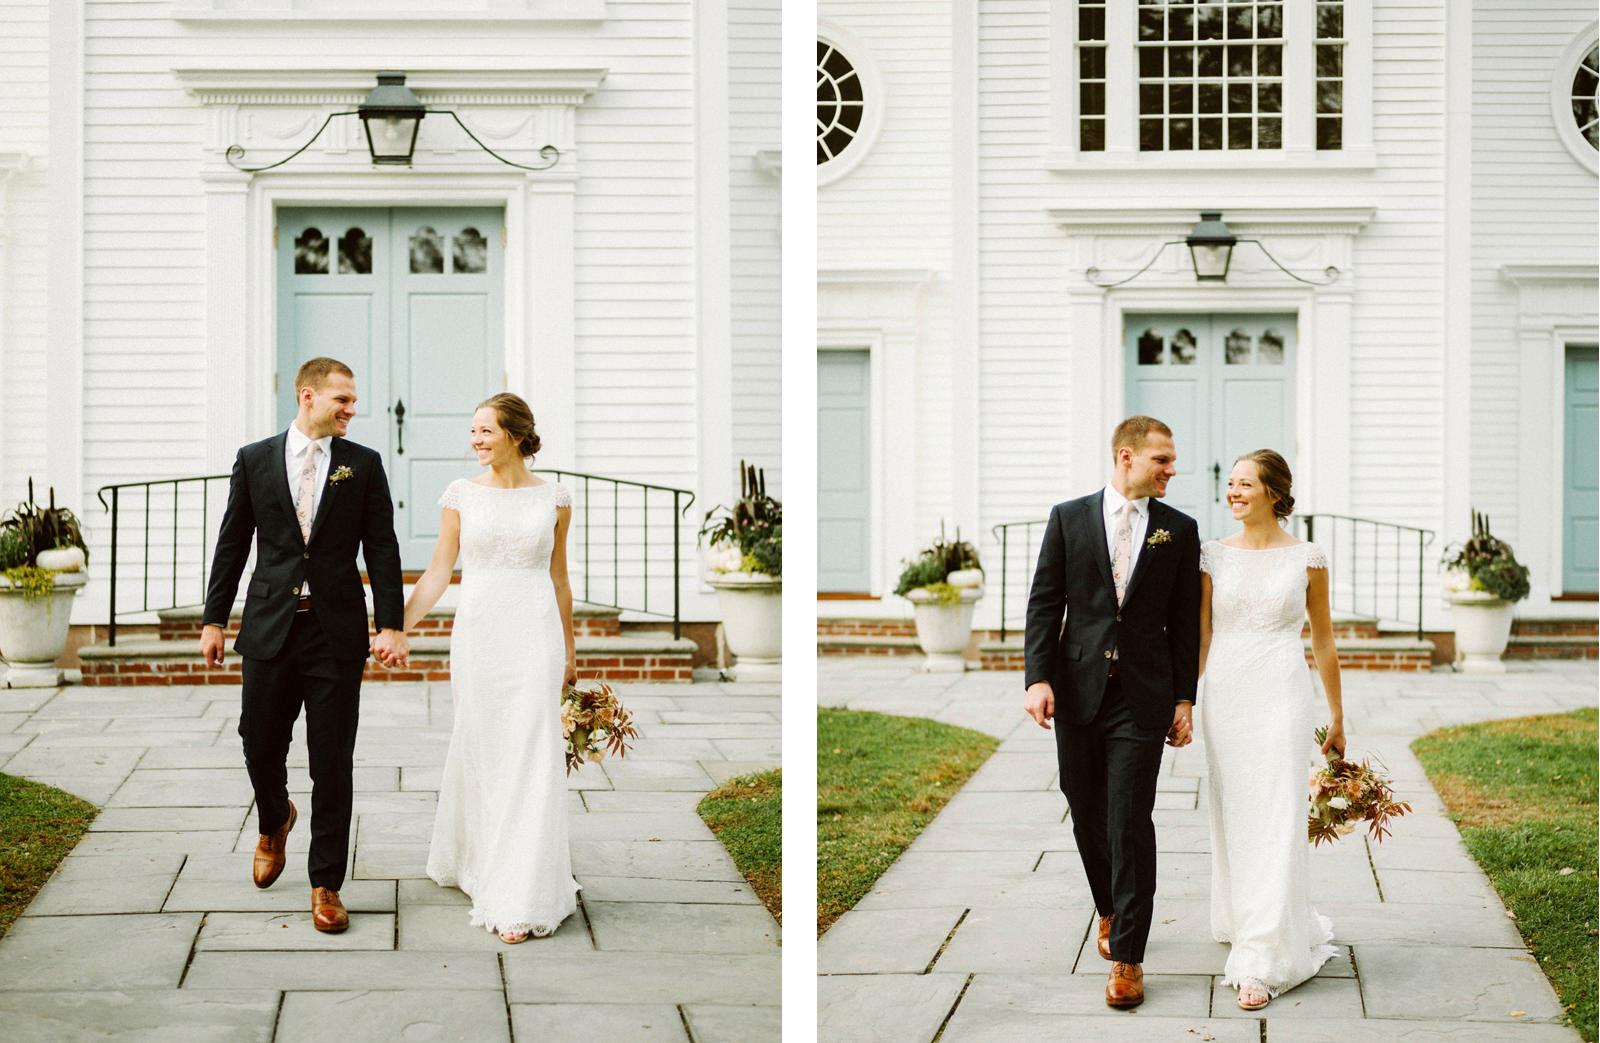 bridgeport-wedding-093 BRIDGEPORT, CONNECTICUT BACKYARD WEDDING